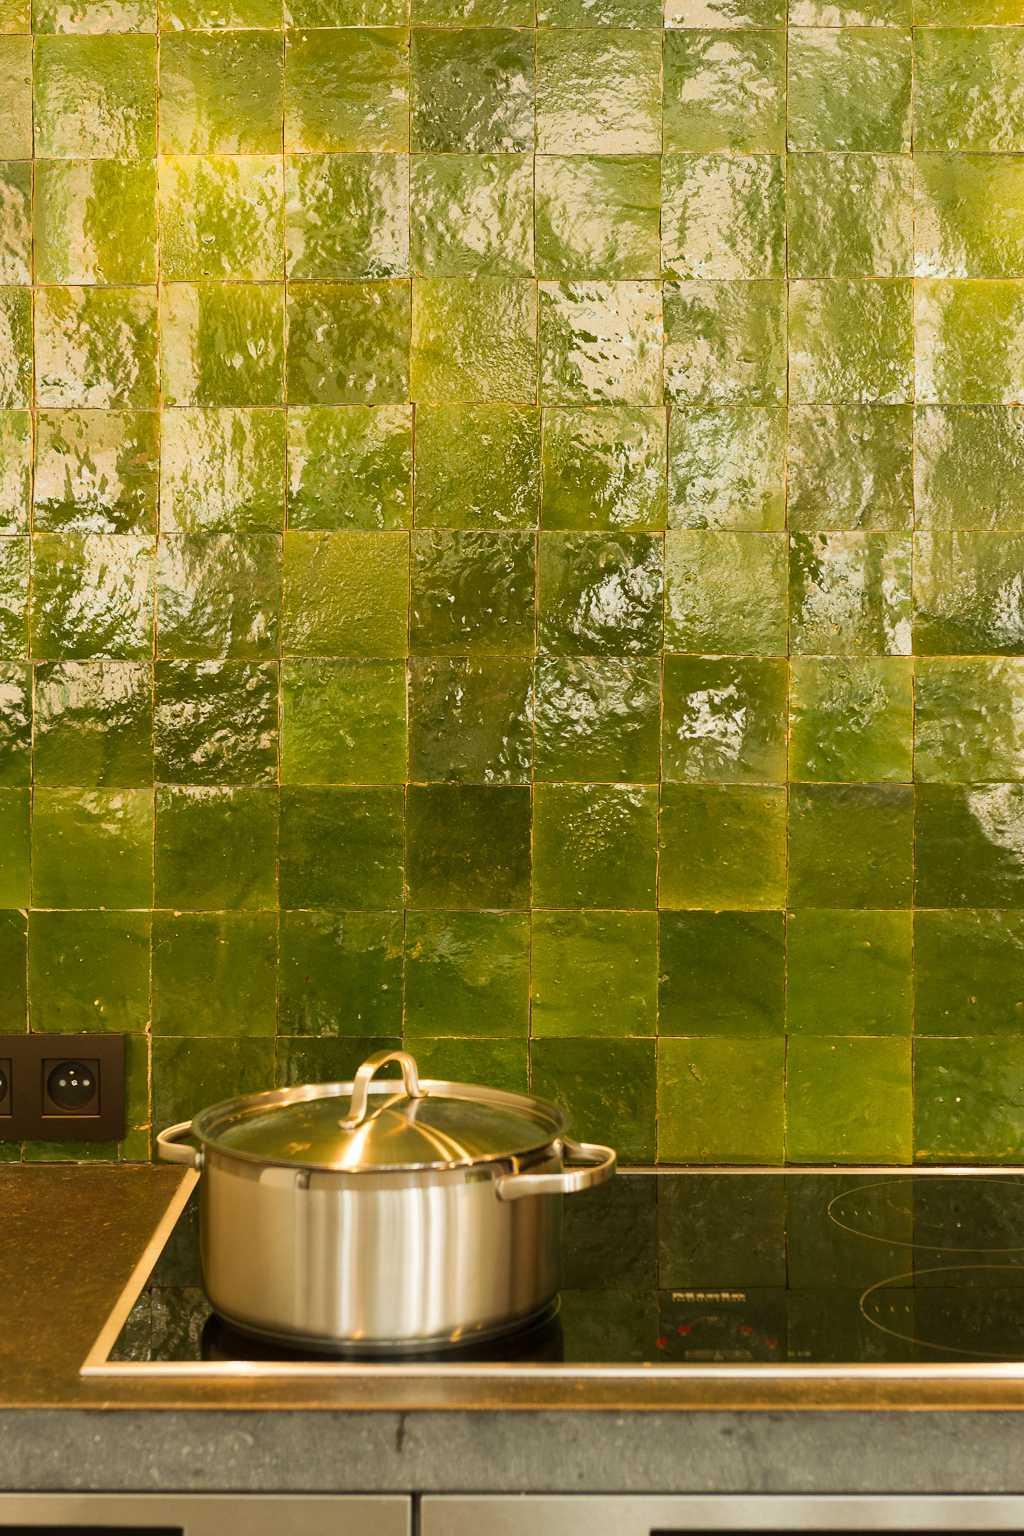 tegels keuken kookpot